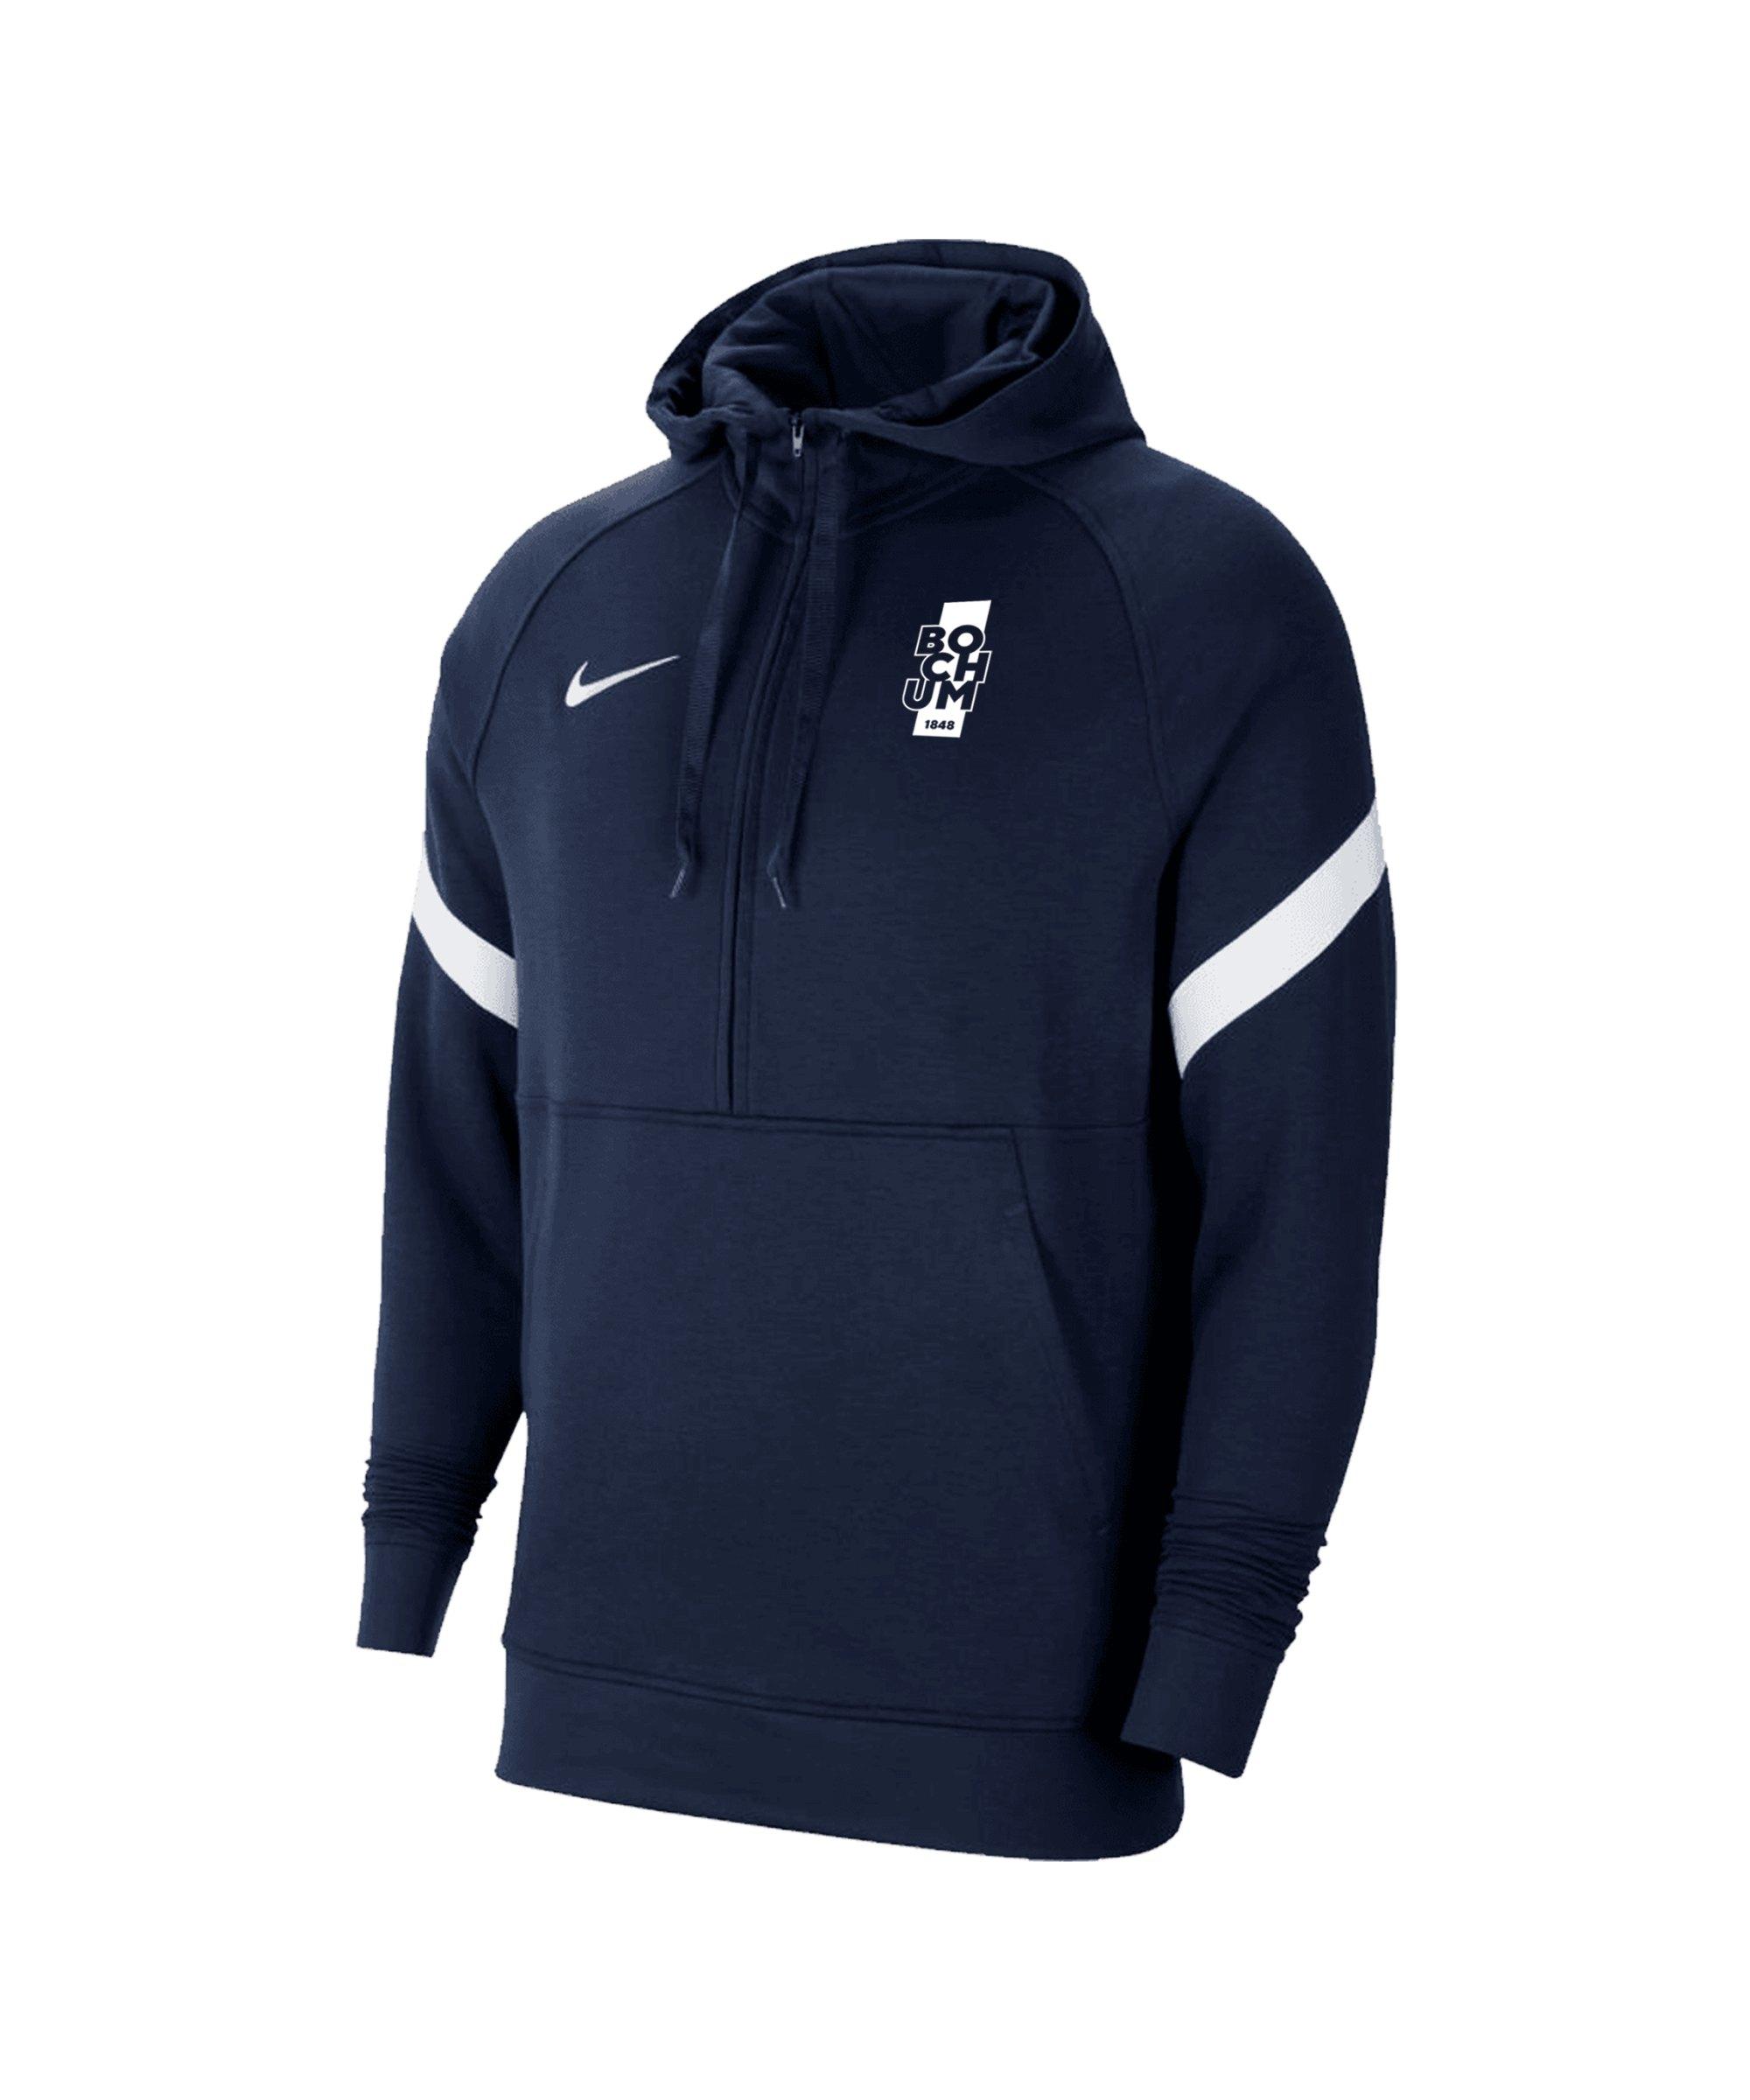 Nike VfL Bochum Lifestyle HalfZip Sweatshirt Blau F451 - blau